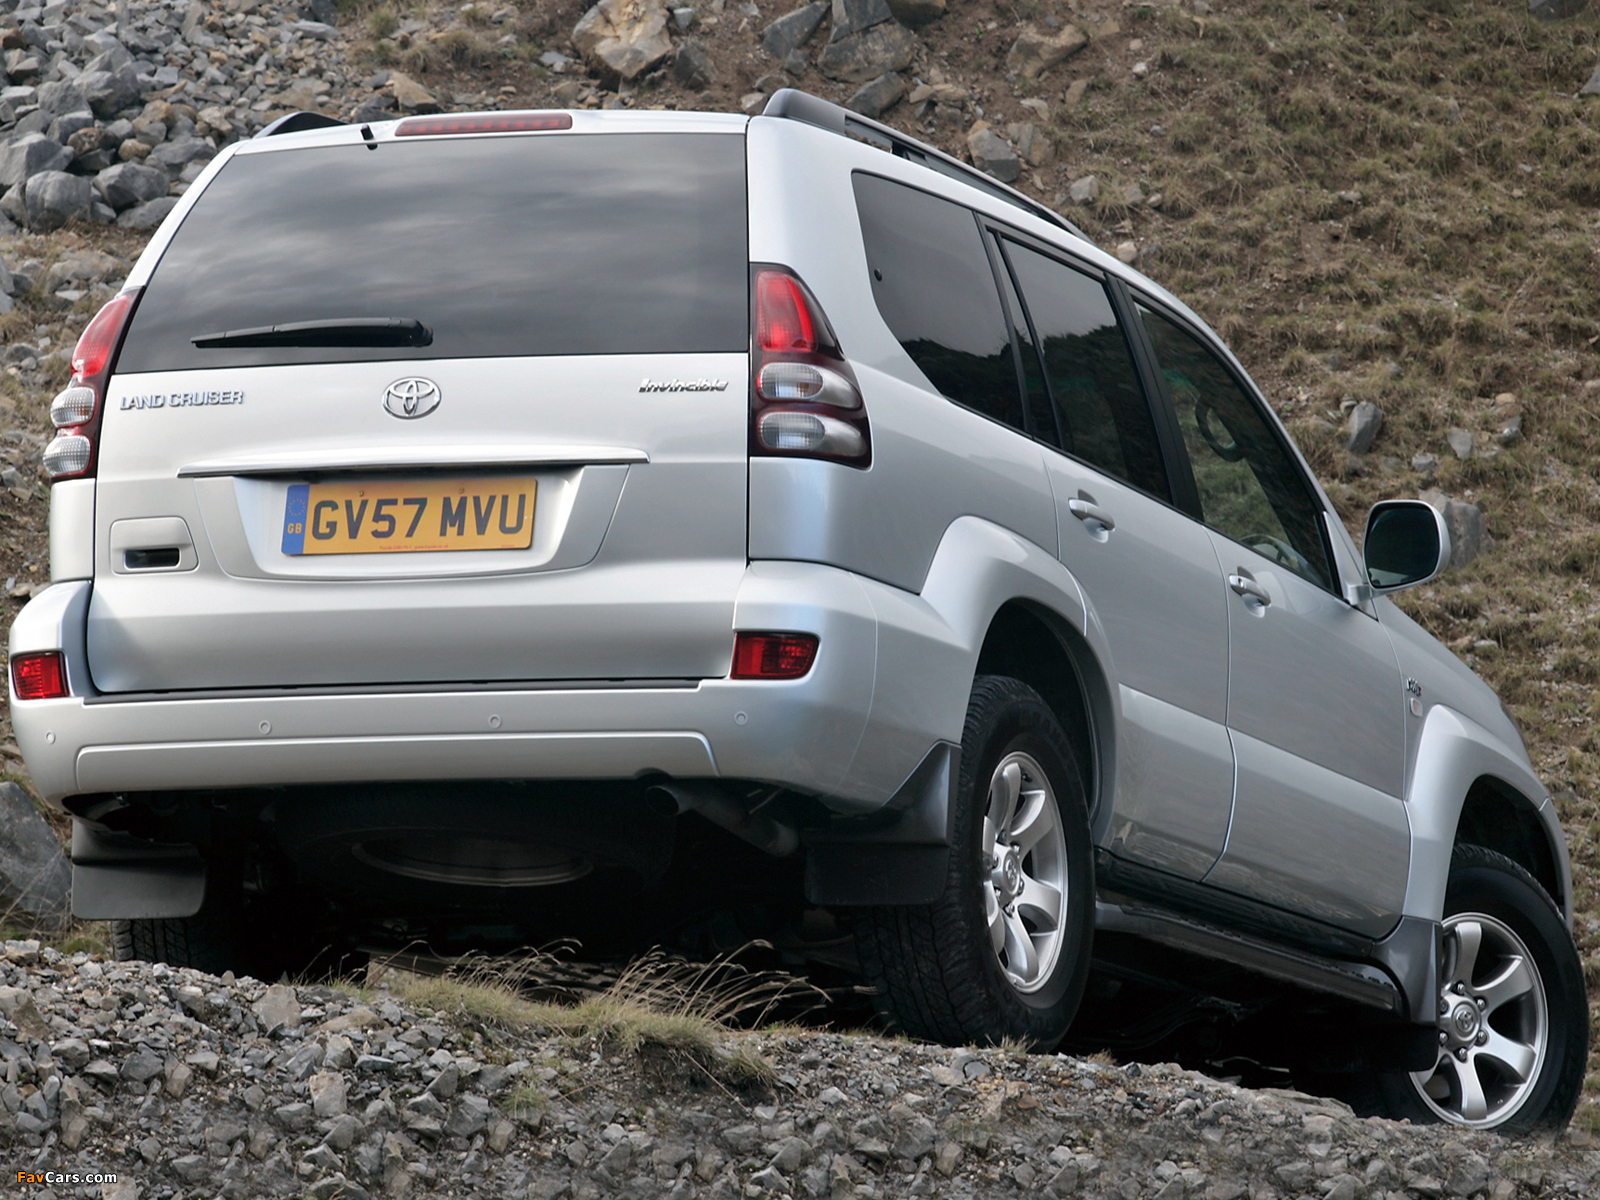 Toyota Land Cruiser Prado Invincible 5-door (J120W) 2007 images (1600